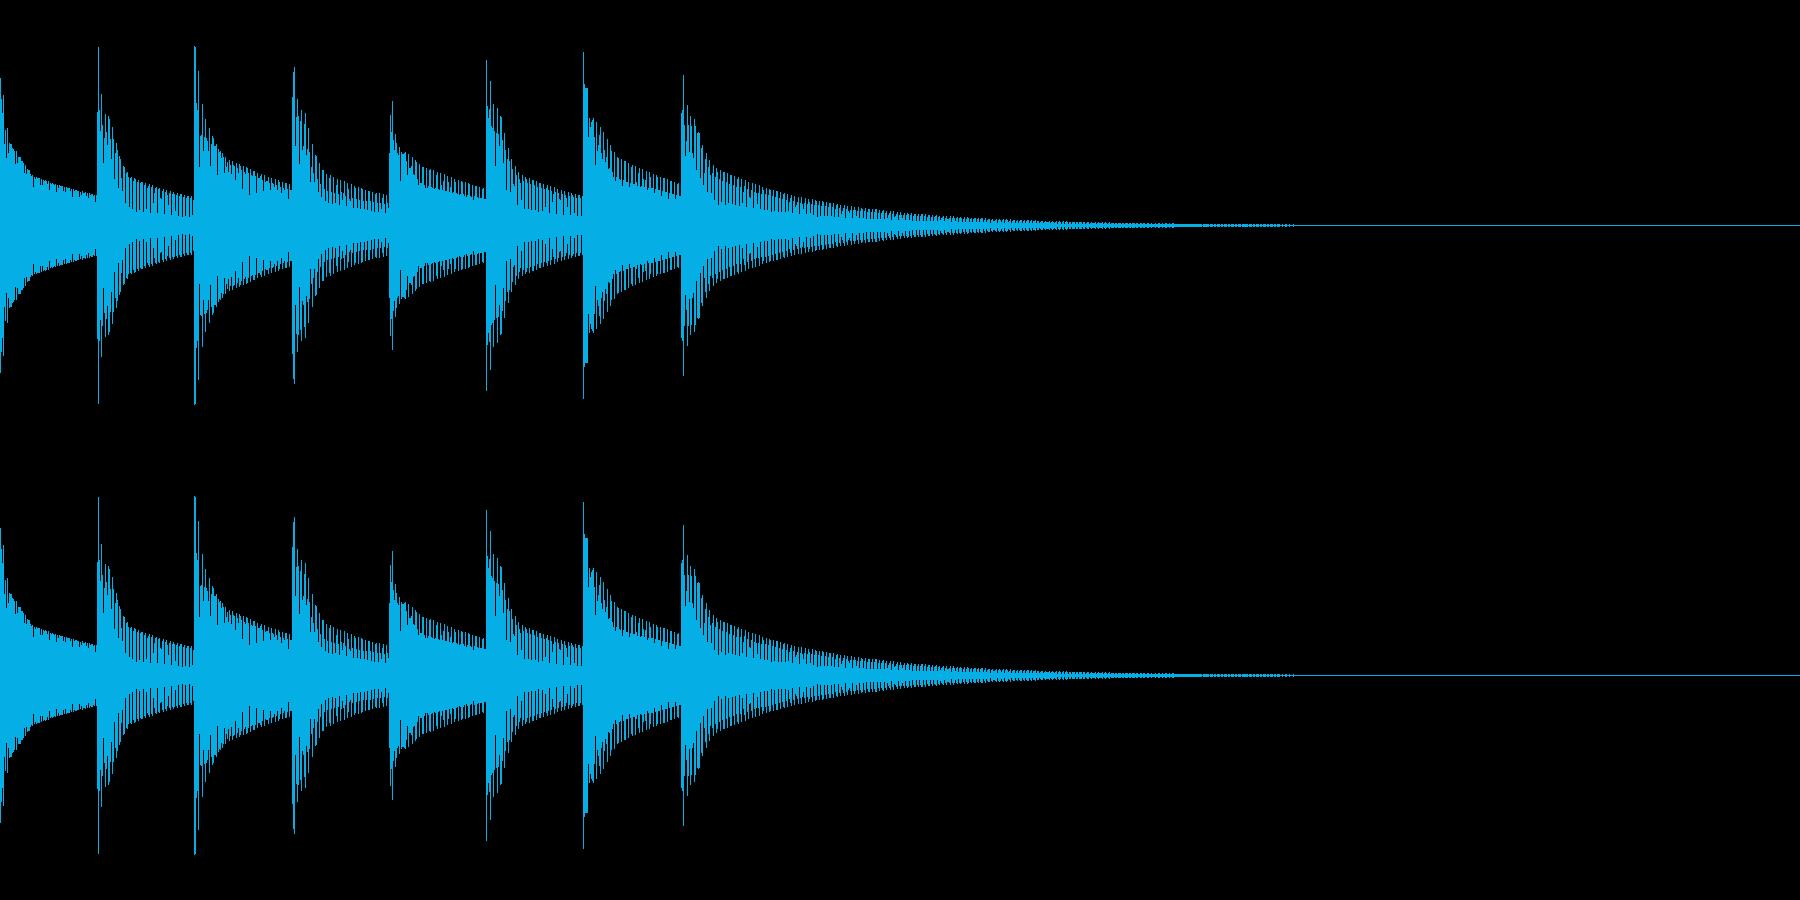 FX・SE/着信音/コール/アラーム/2の再生済みの波形